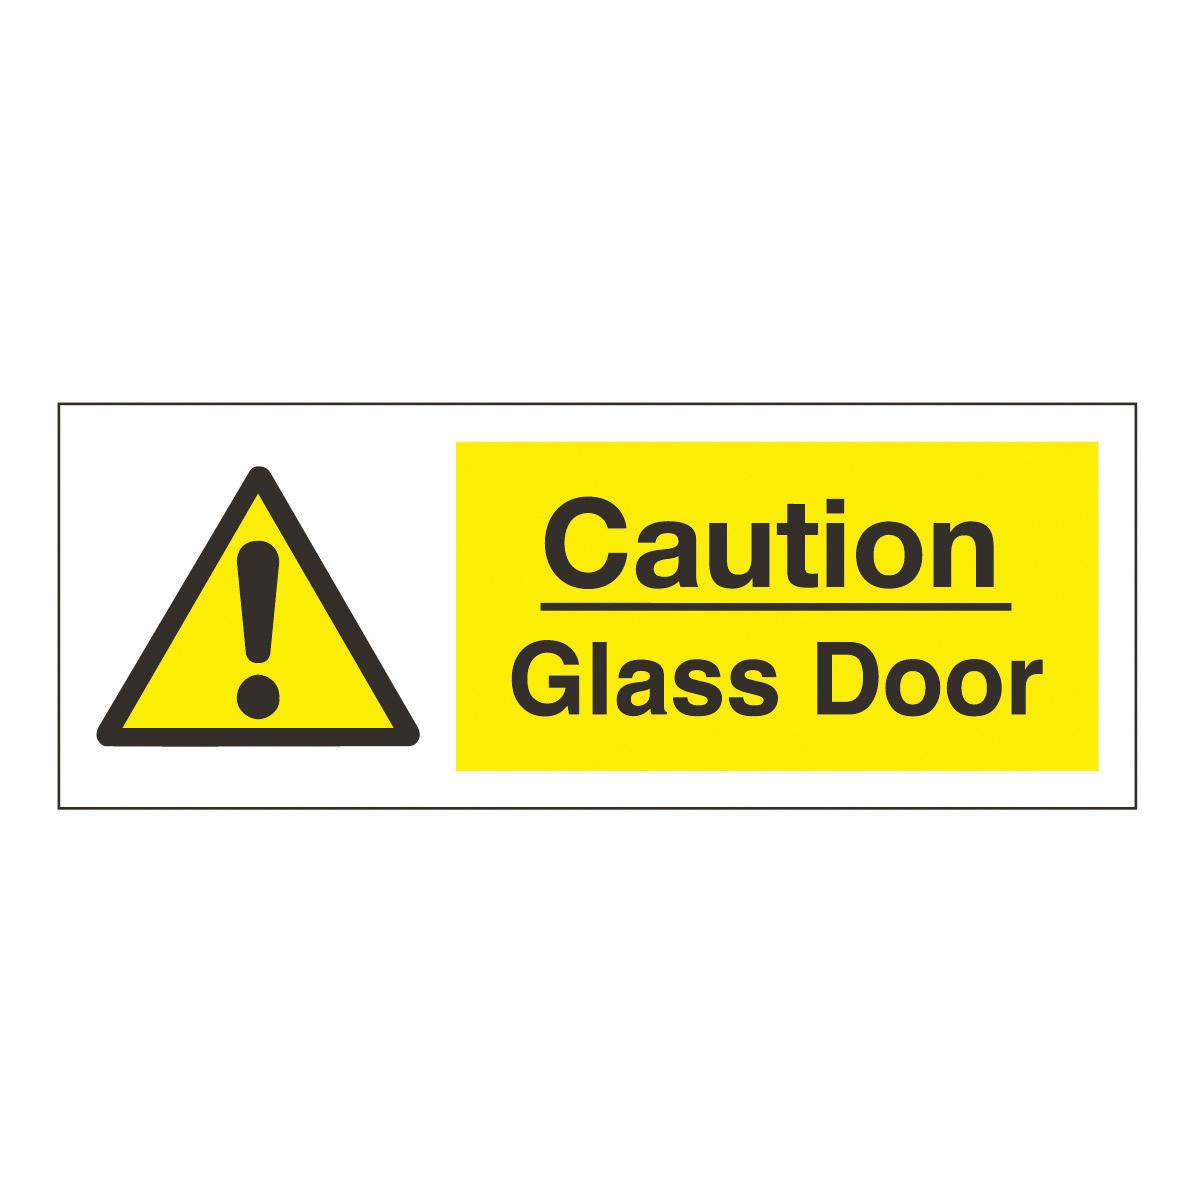 Caution Glass Door Safety Sign Hazard Amp Warning Sign